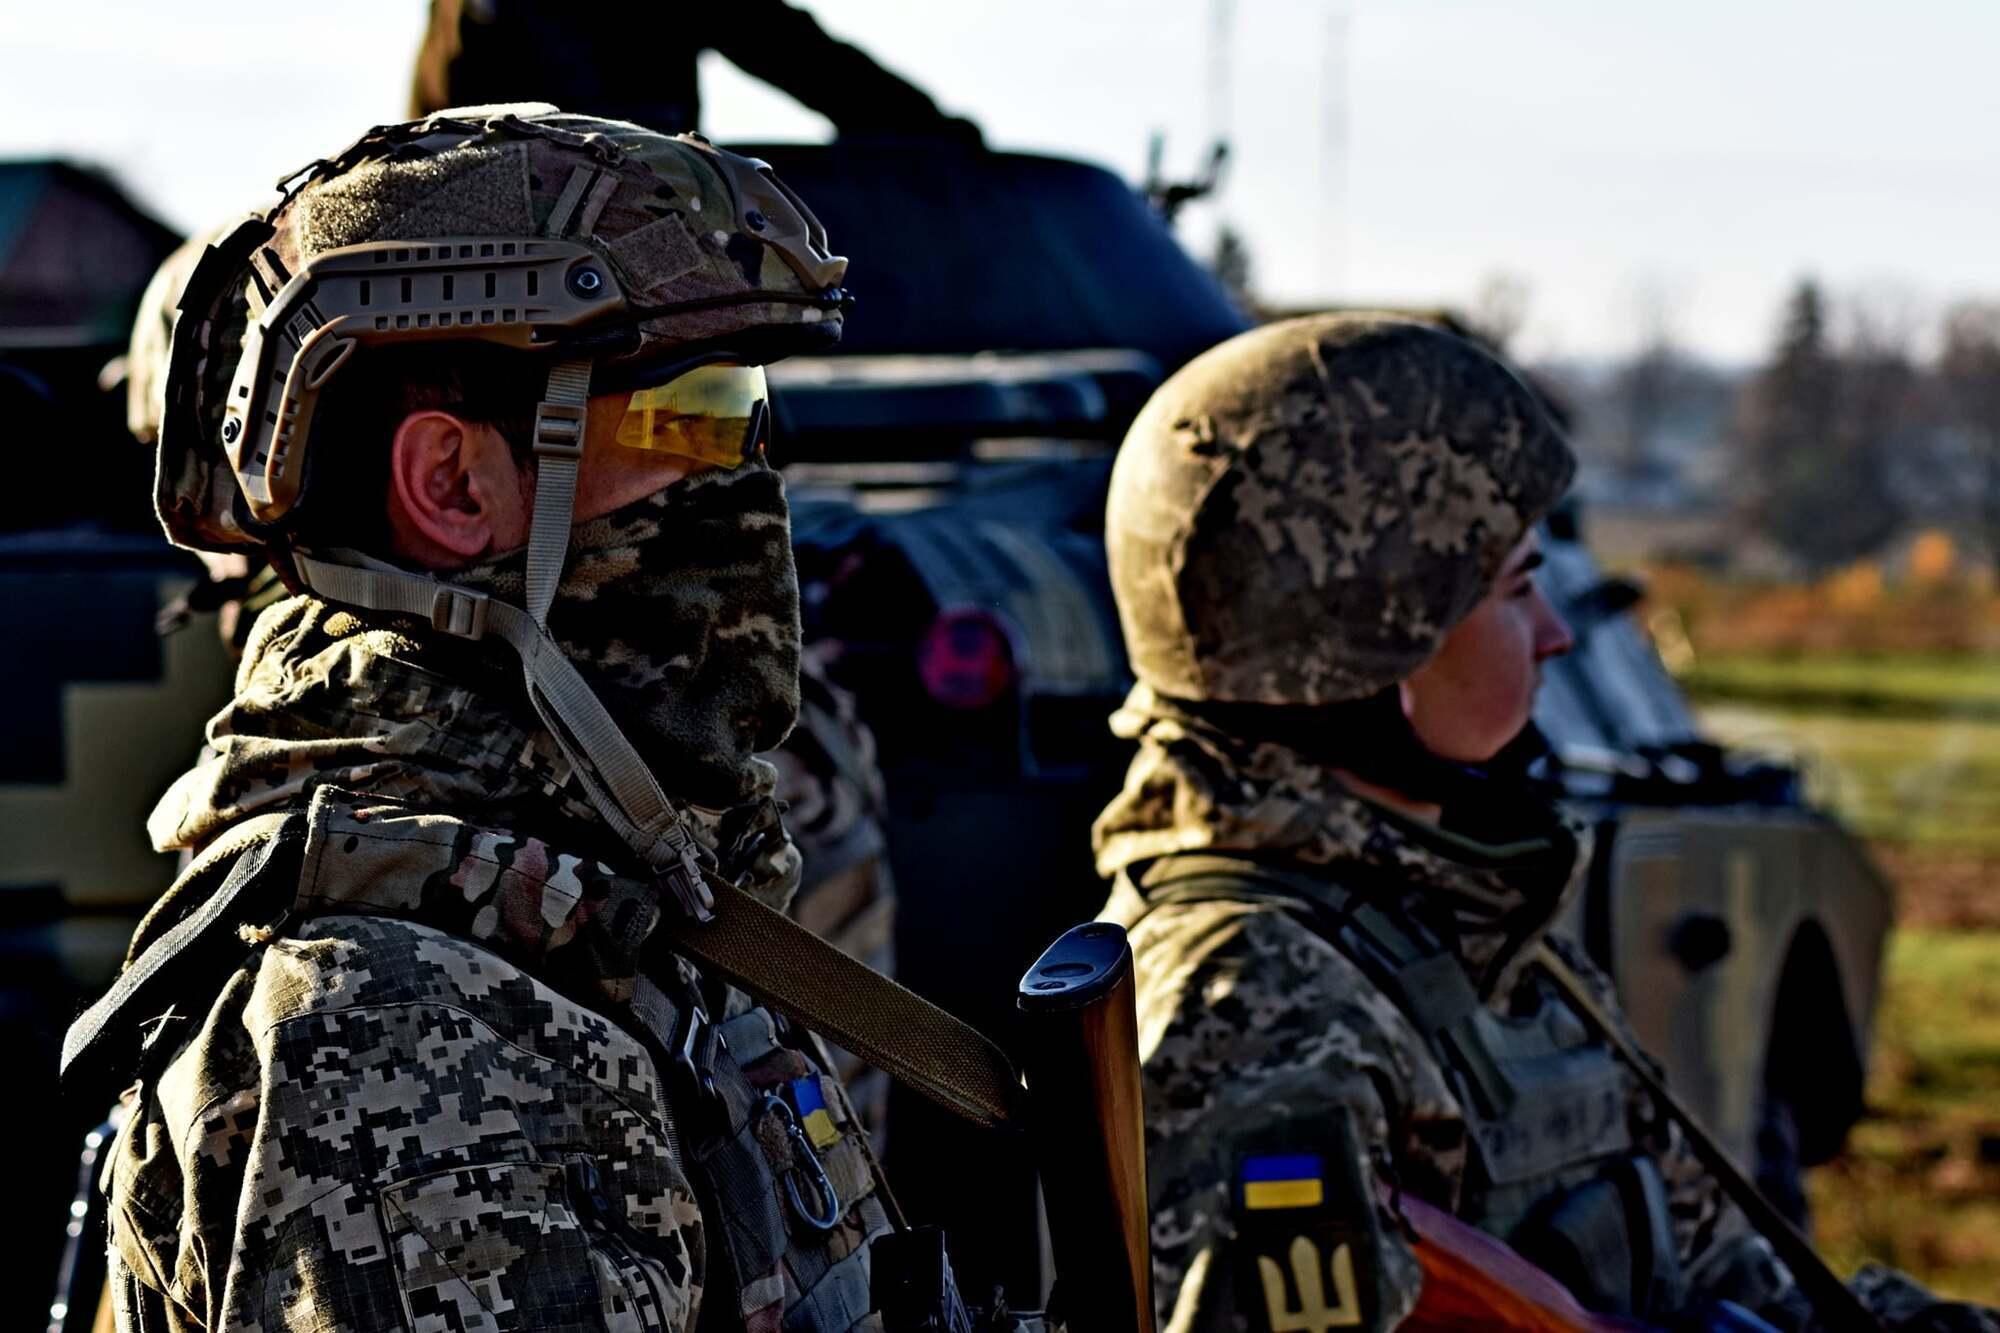 Бригада ВСУ проходит учения по стандартам НАТО